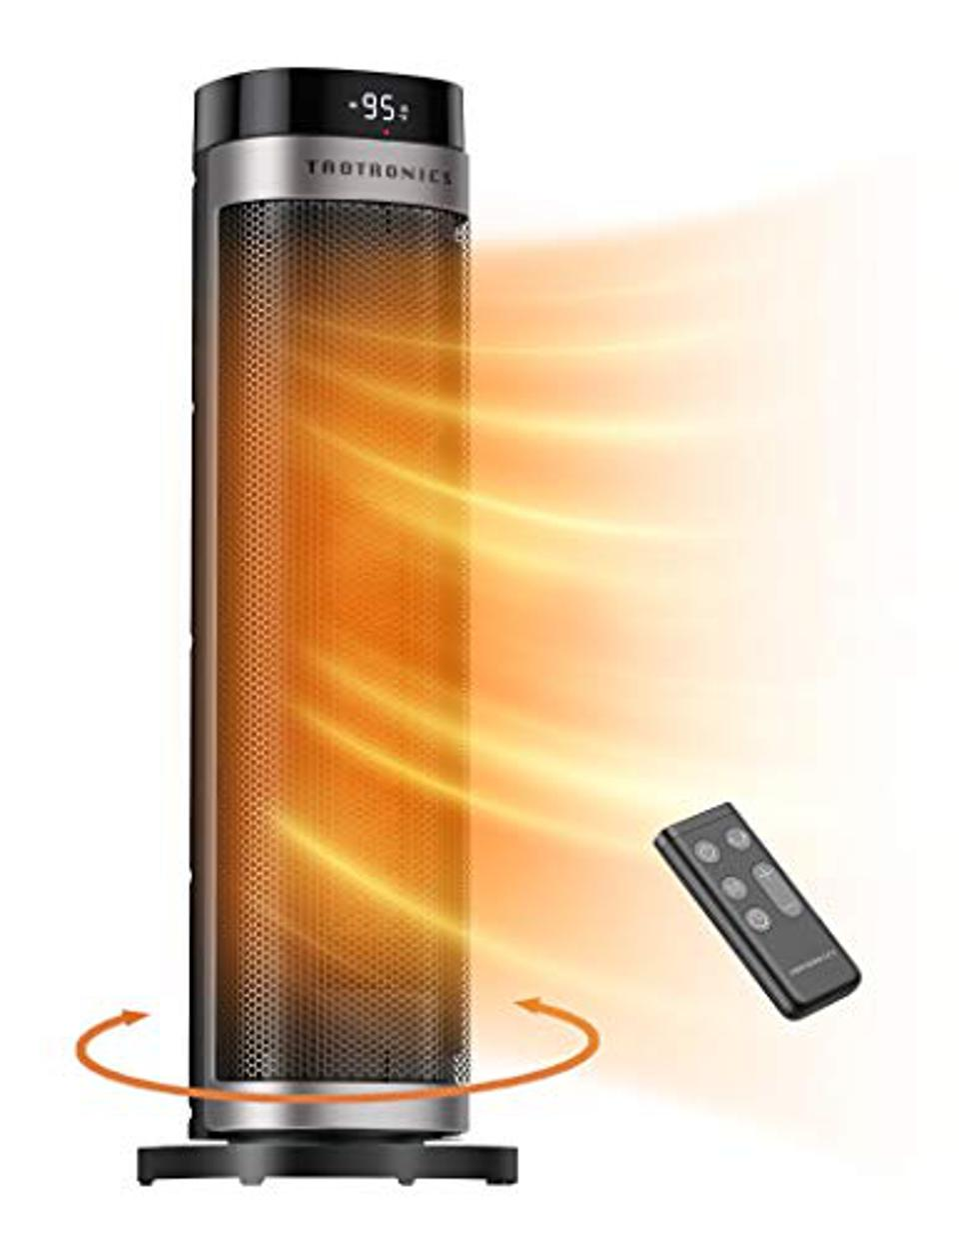 TaoTronics PTC 1500W Oscillating Portable Heater with Remote